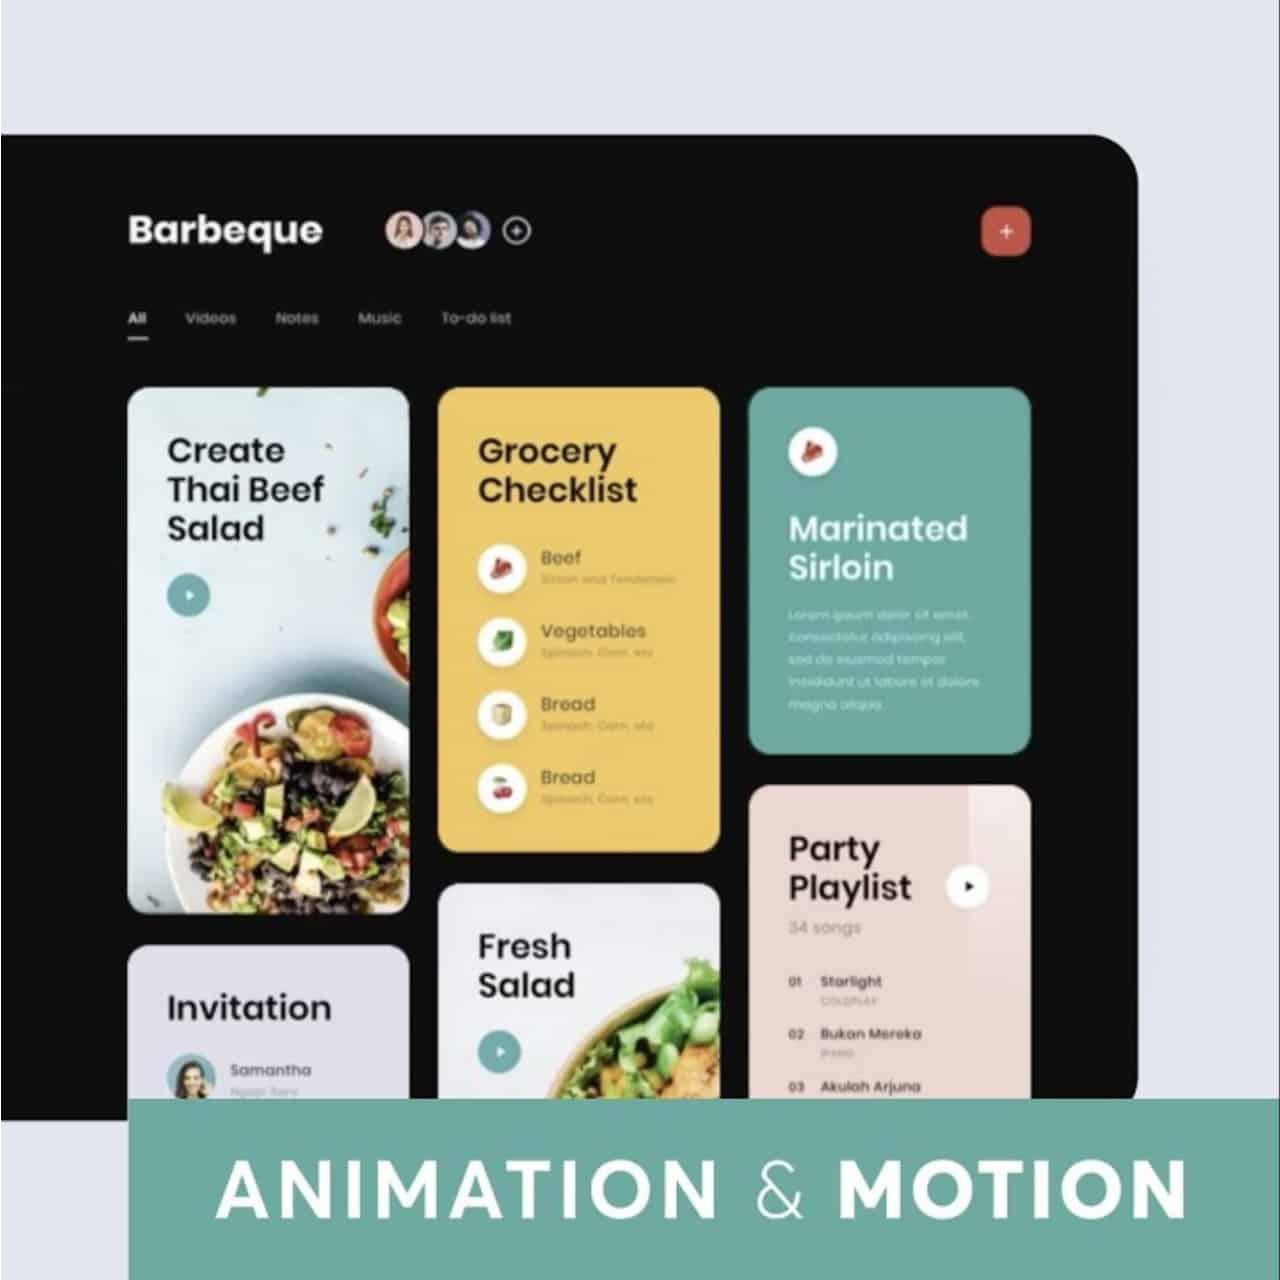 animation&motion